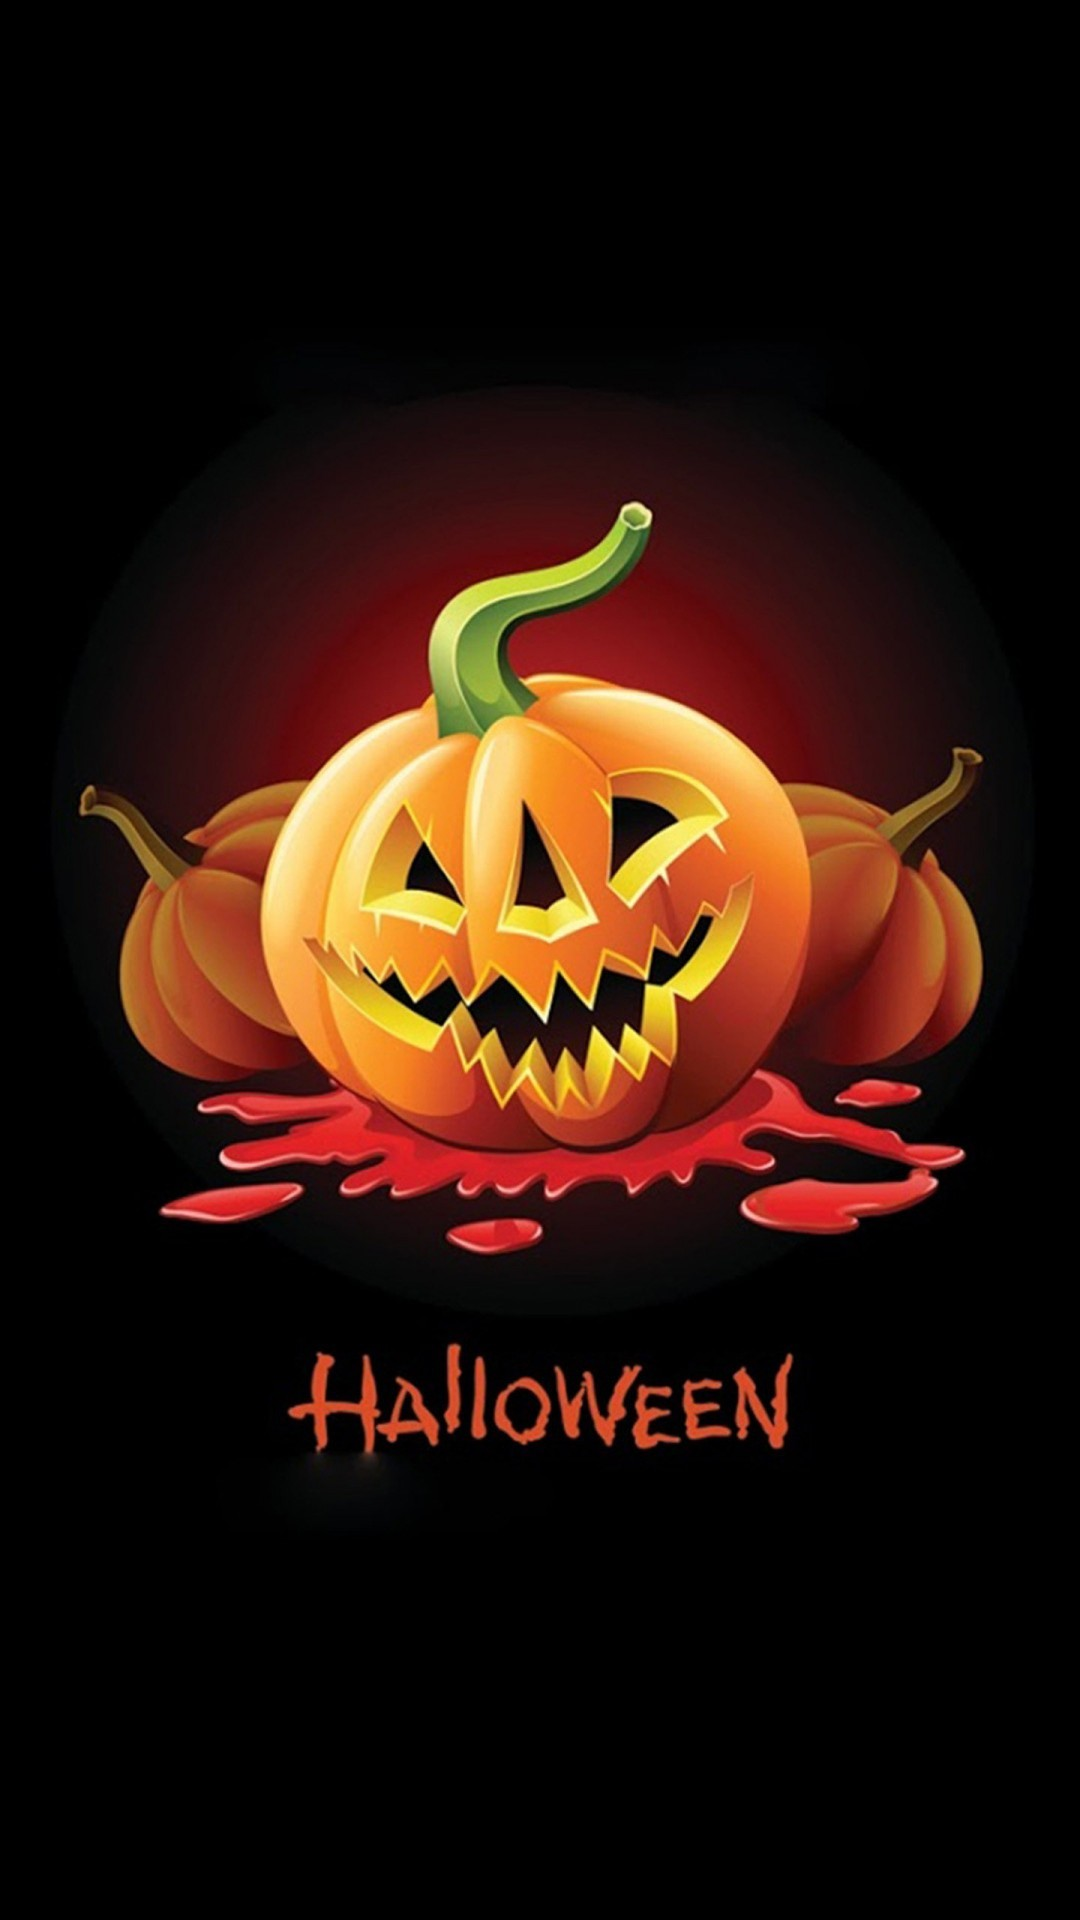 Wonderful Wallpaper Halloween Galaxy S5 - halloween-pumpkin-2-wallpaper-background-1080x1920  Snapshot_199677.jpg